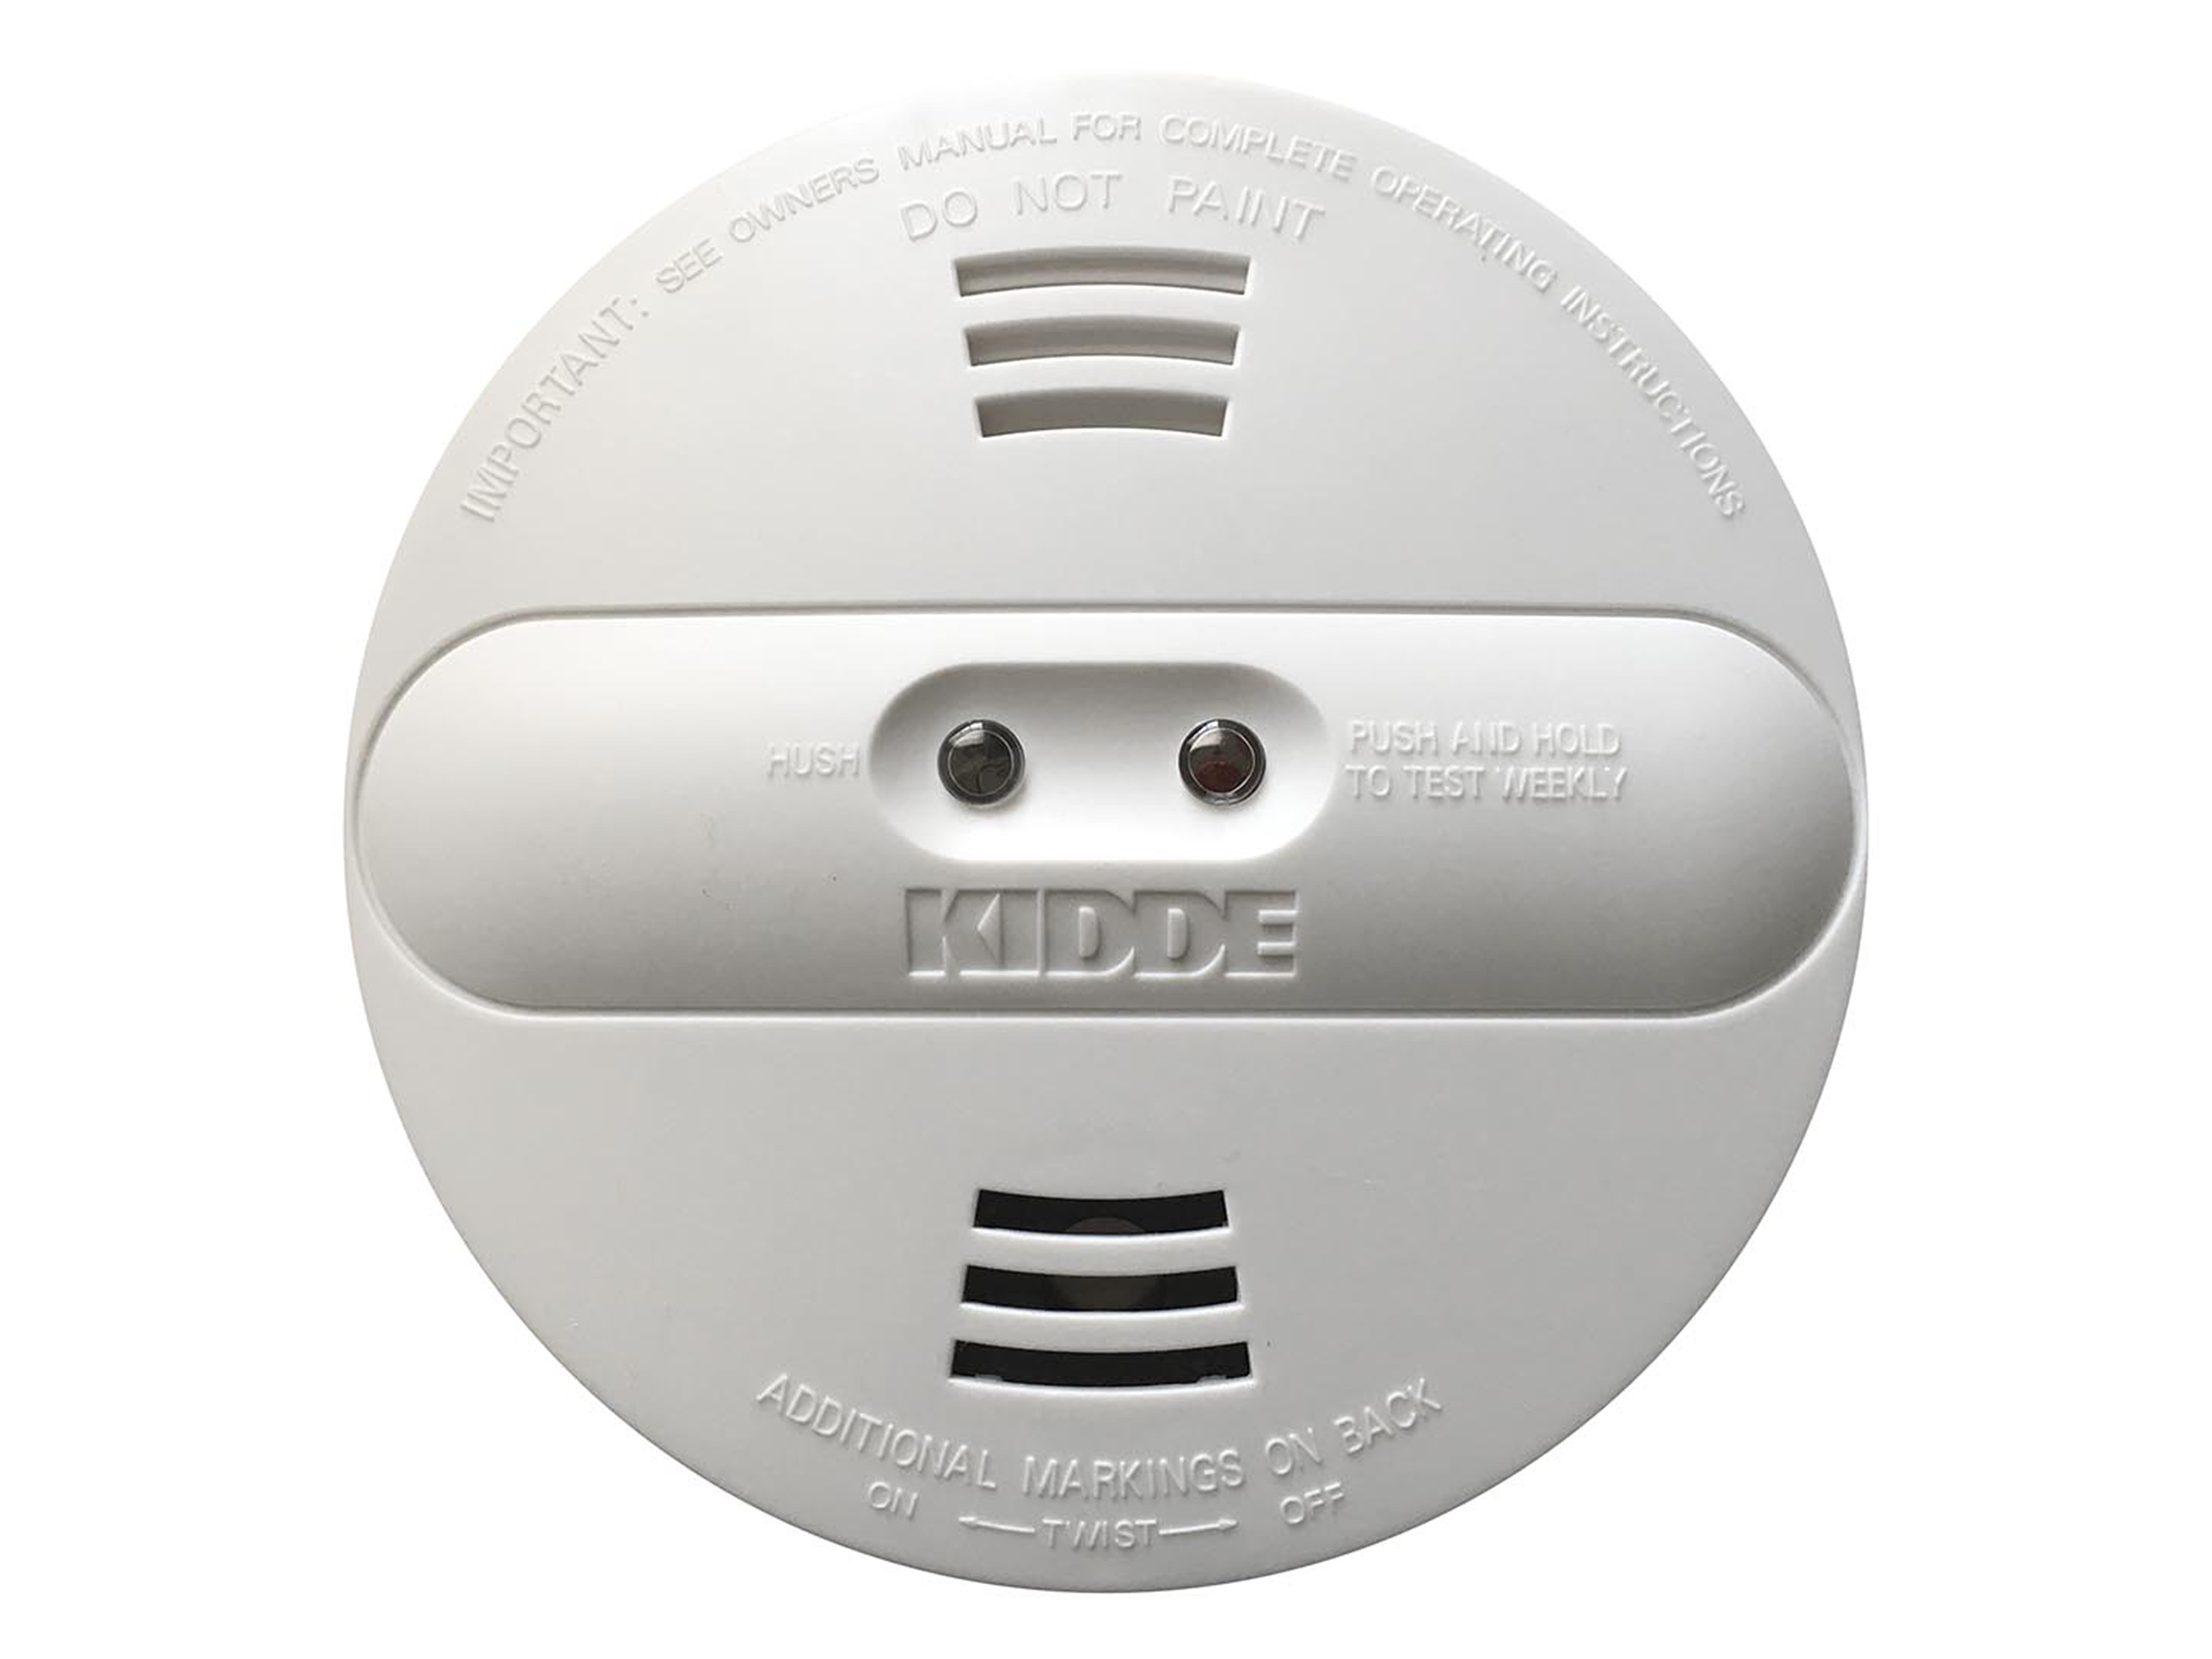 Kidde dual-sensor (photoelectric and ionization) smoke alarms – models PI2010 and PI9010